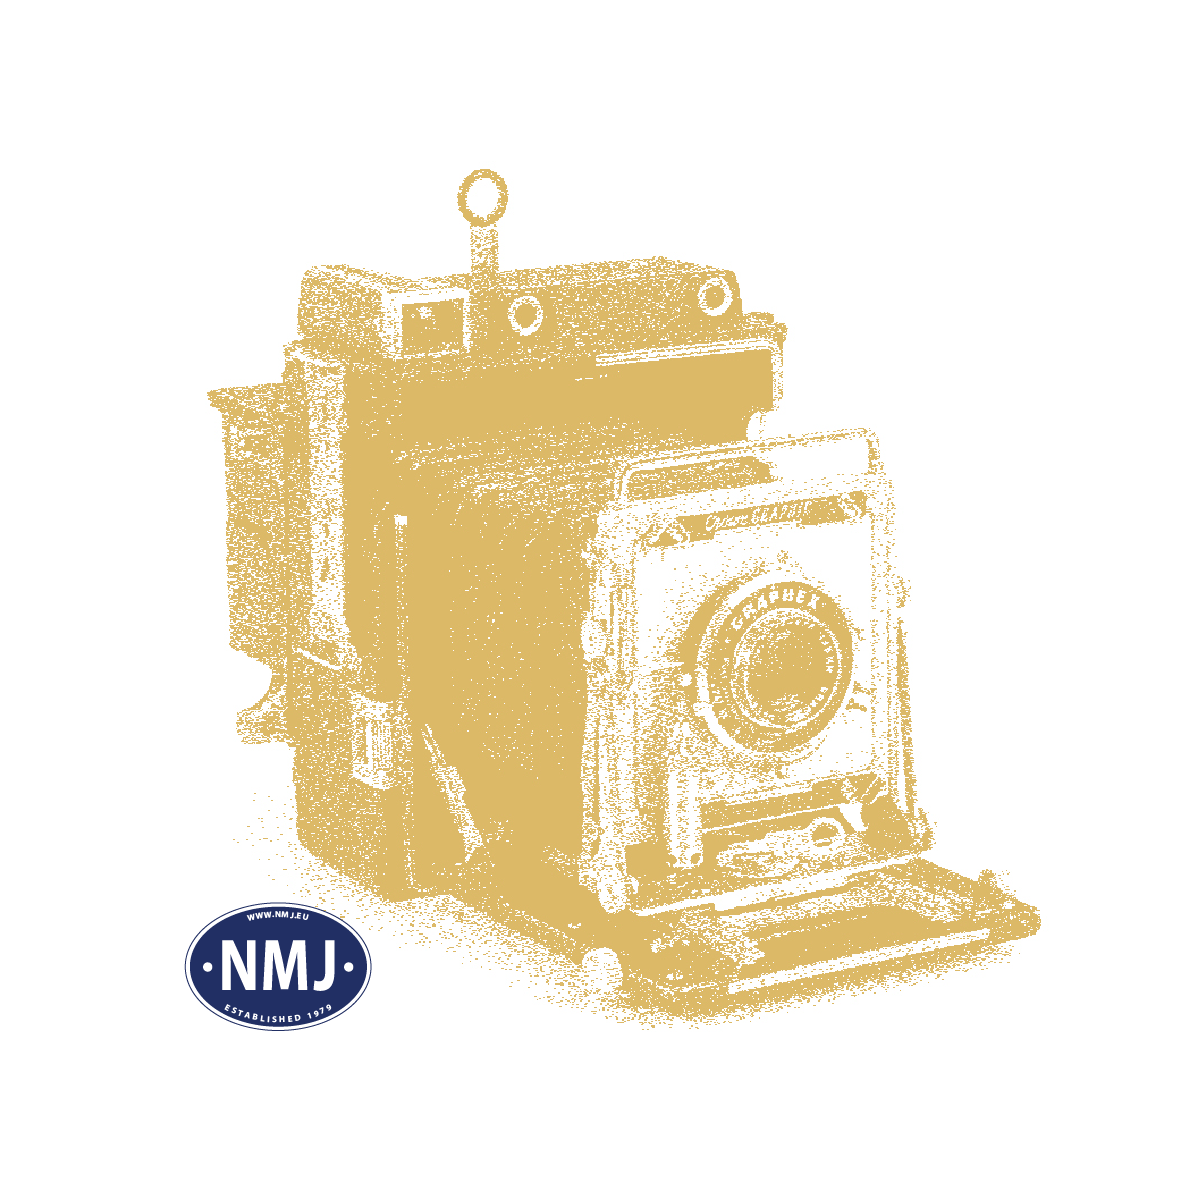 NMJT85.201 - NMJ Topline CargoNet Di8.702, DC